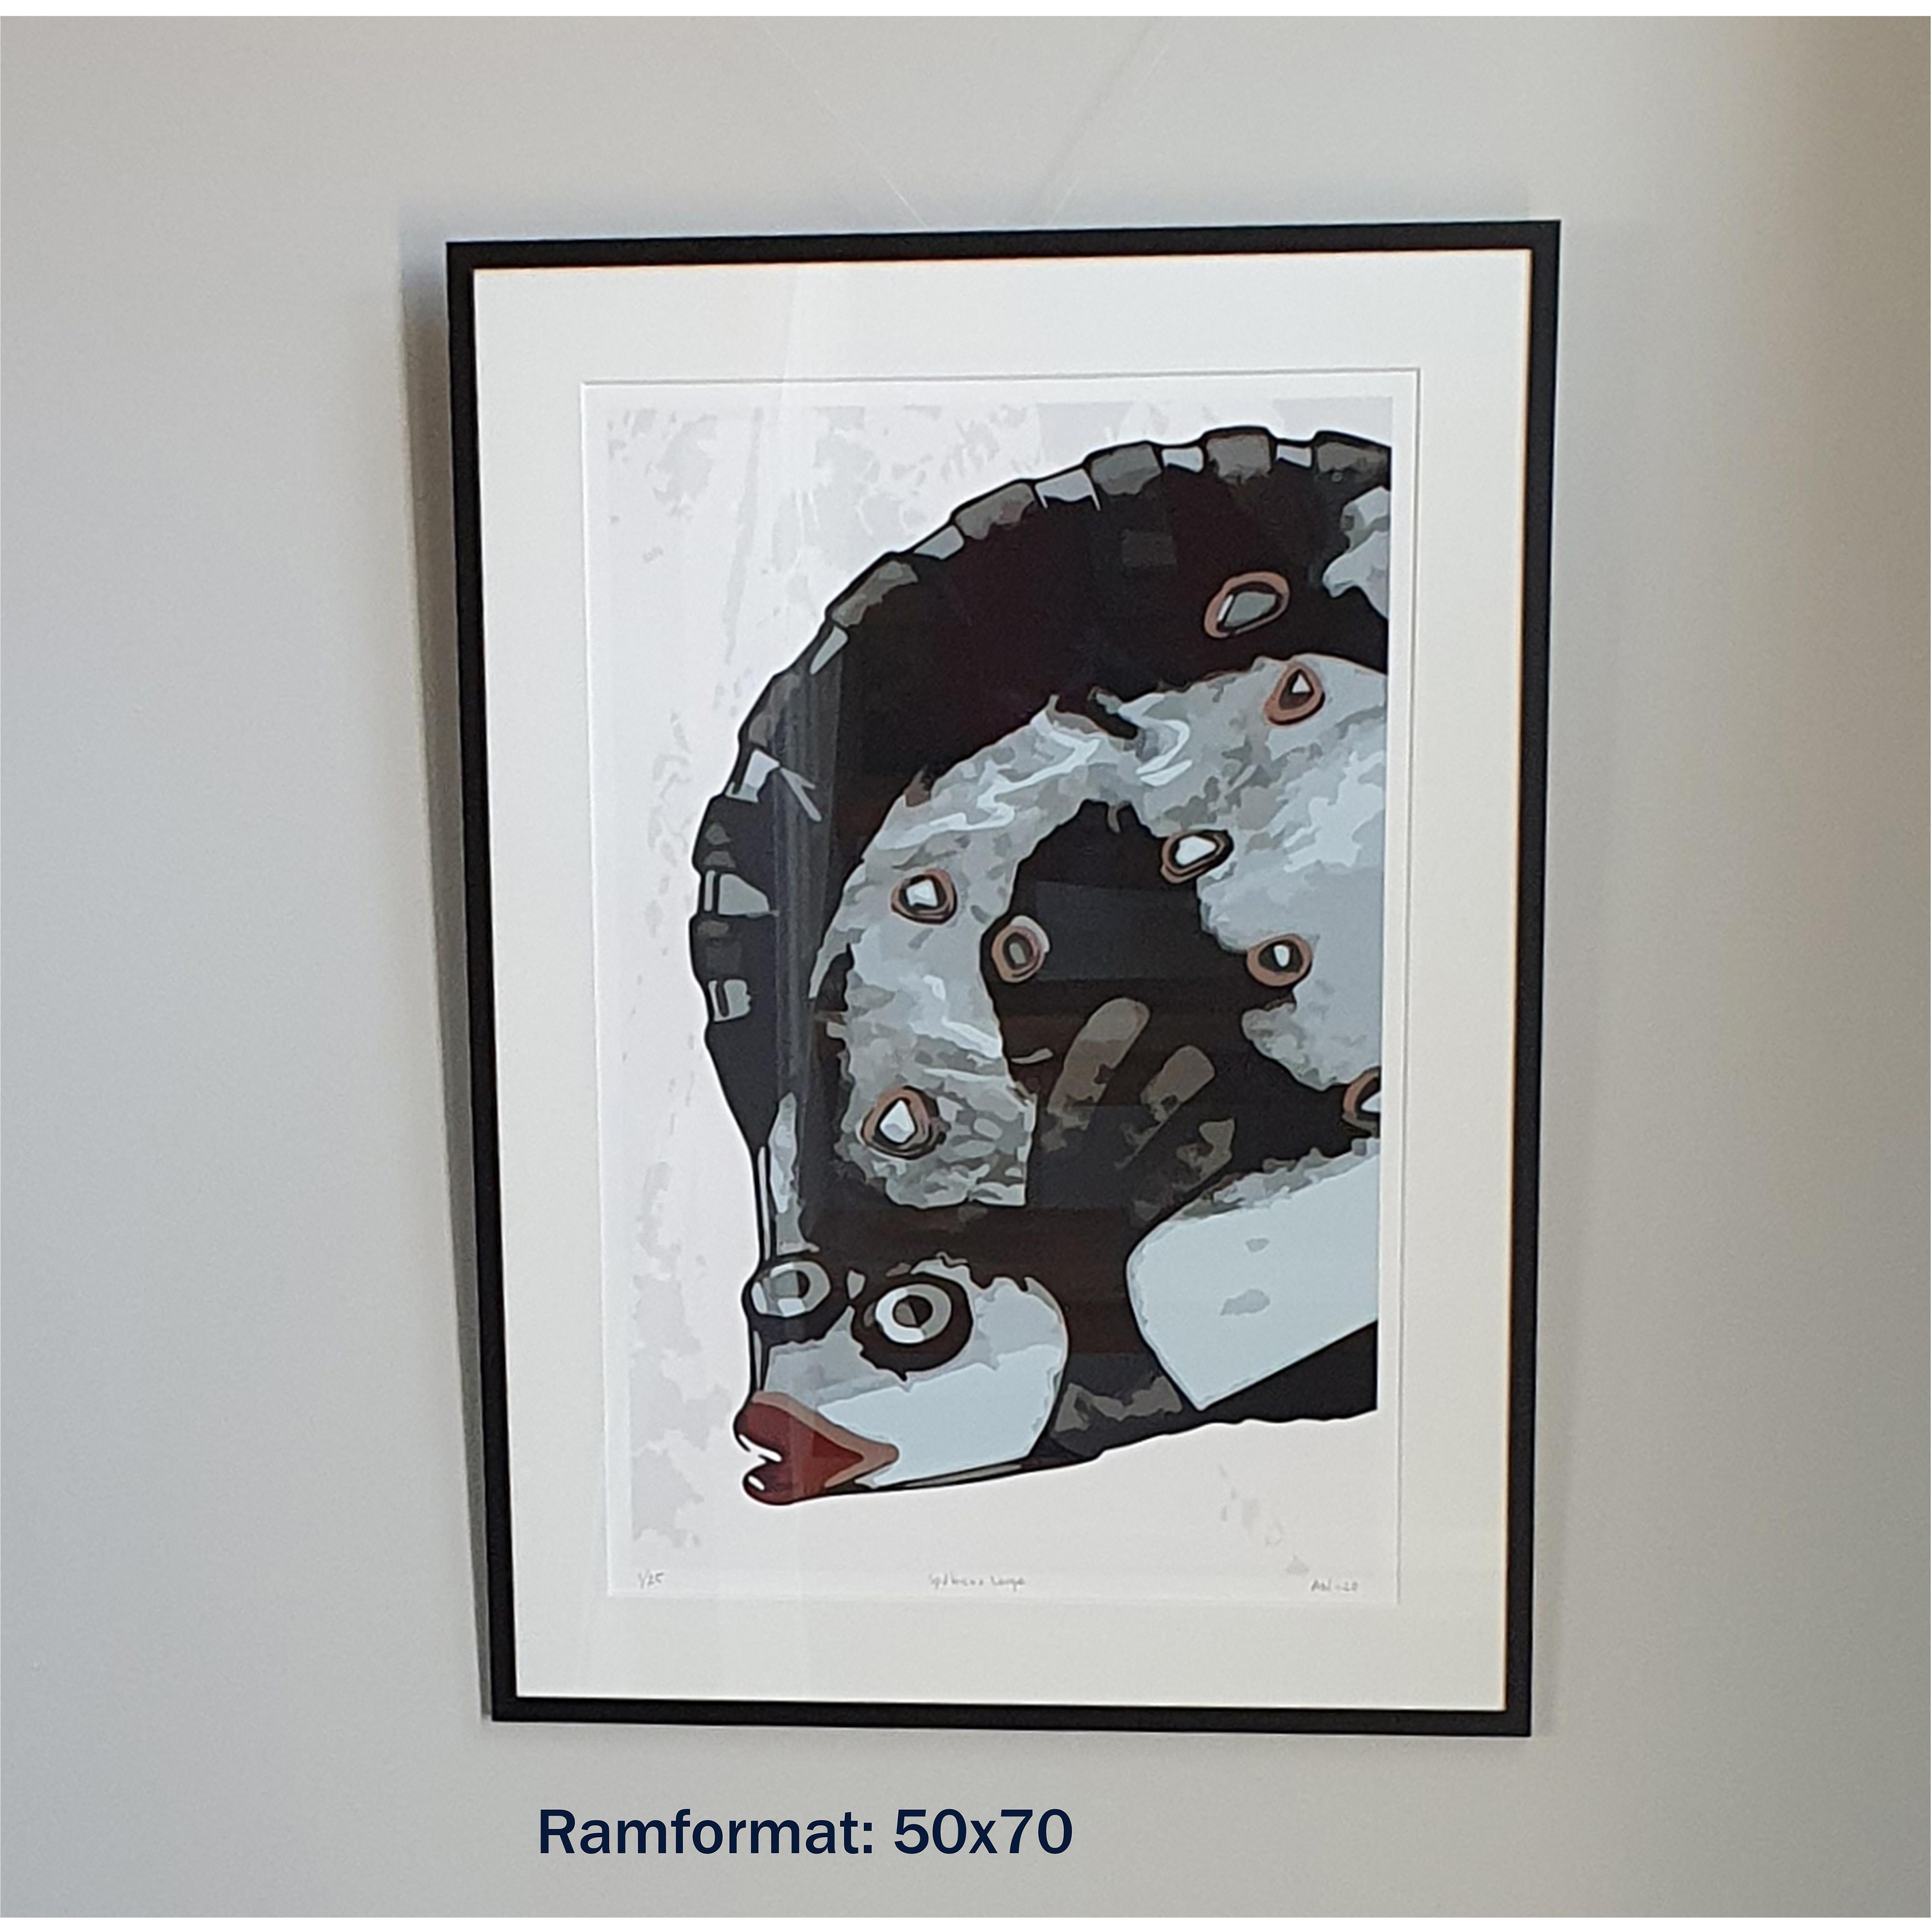 'Spätticus Large' artprint